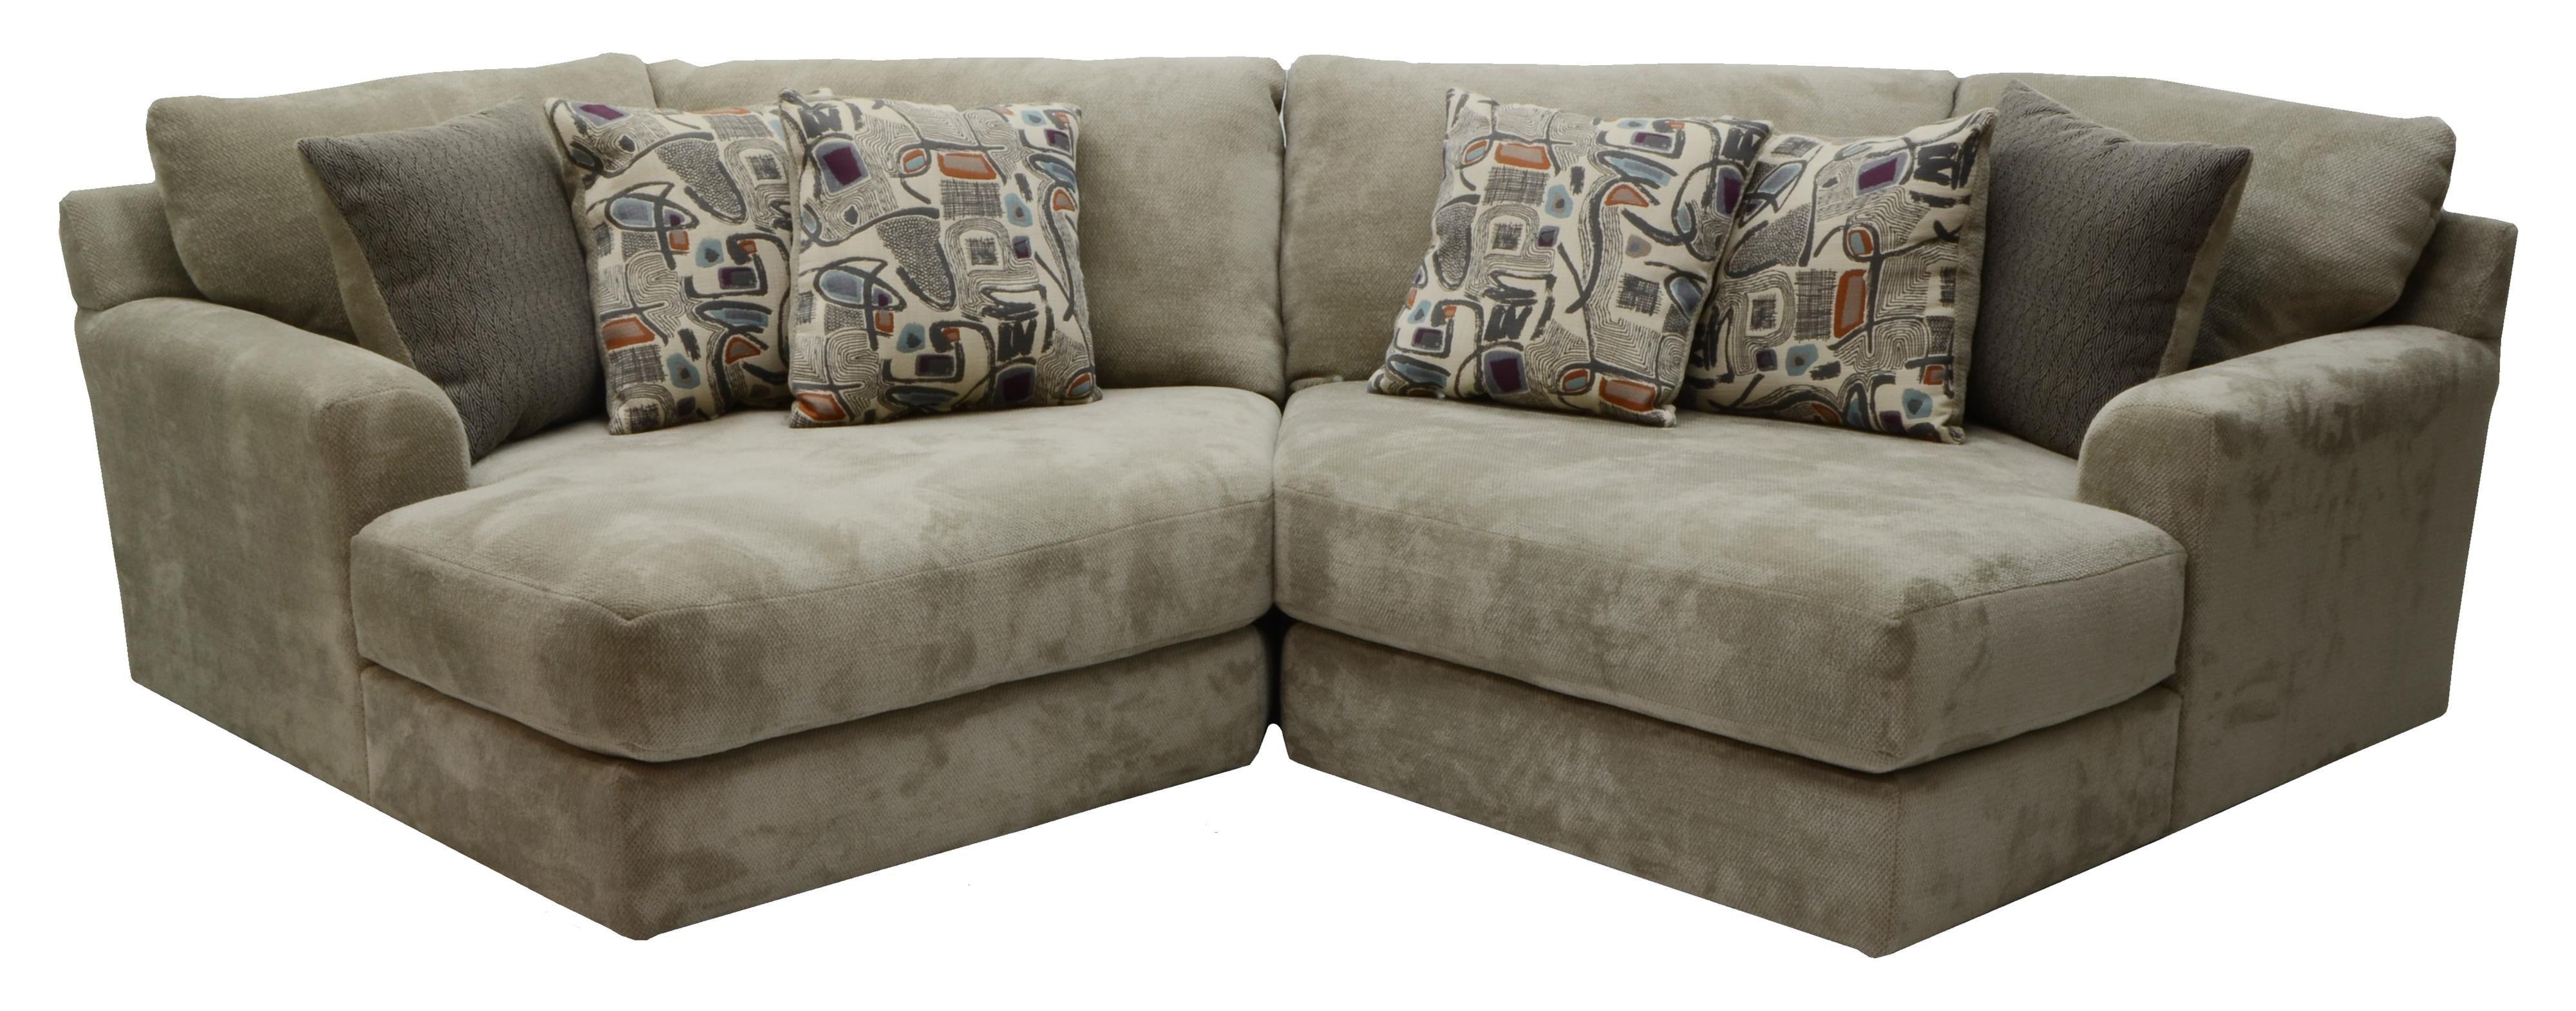 Malibu Two Seat Sectional By Jackson Furniture Sectional Sofa Jackson Furniture Furniture